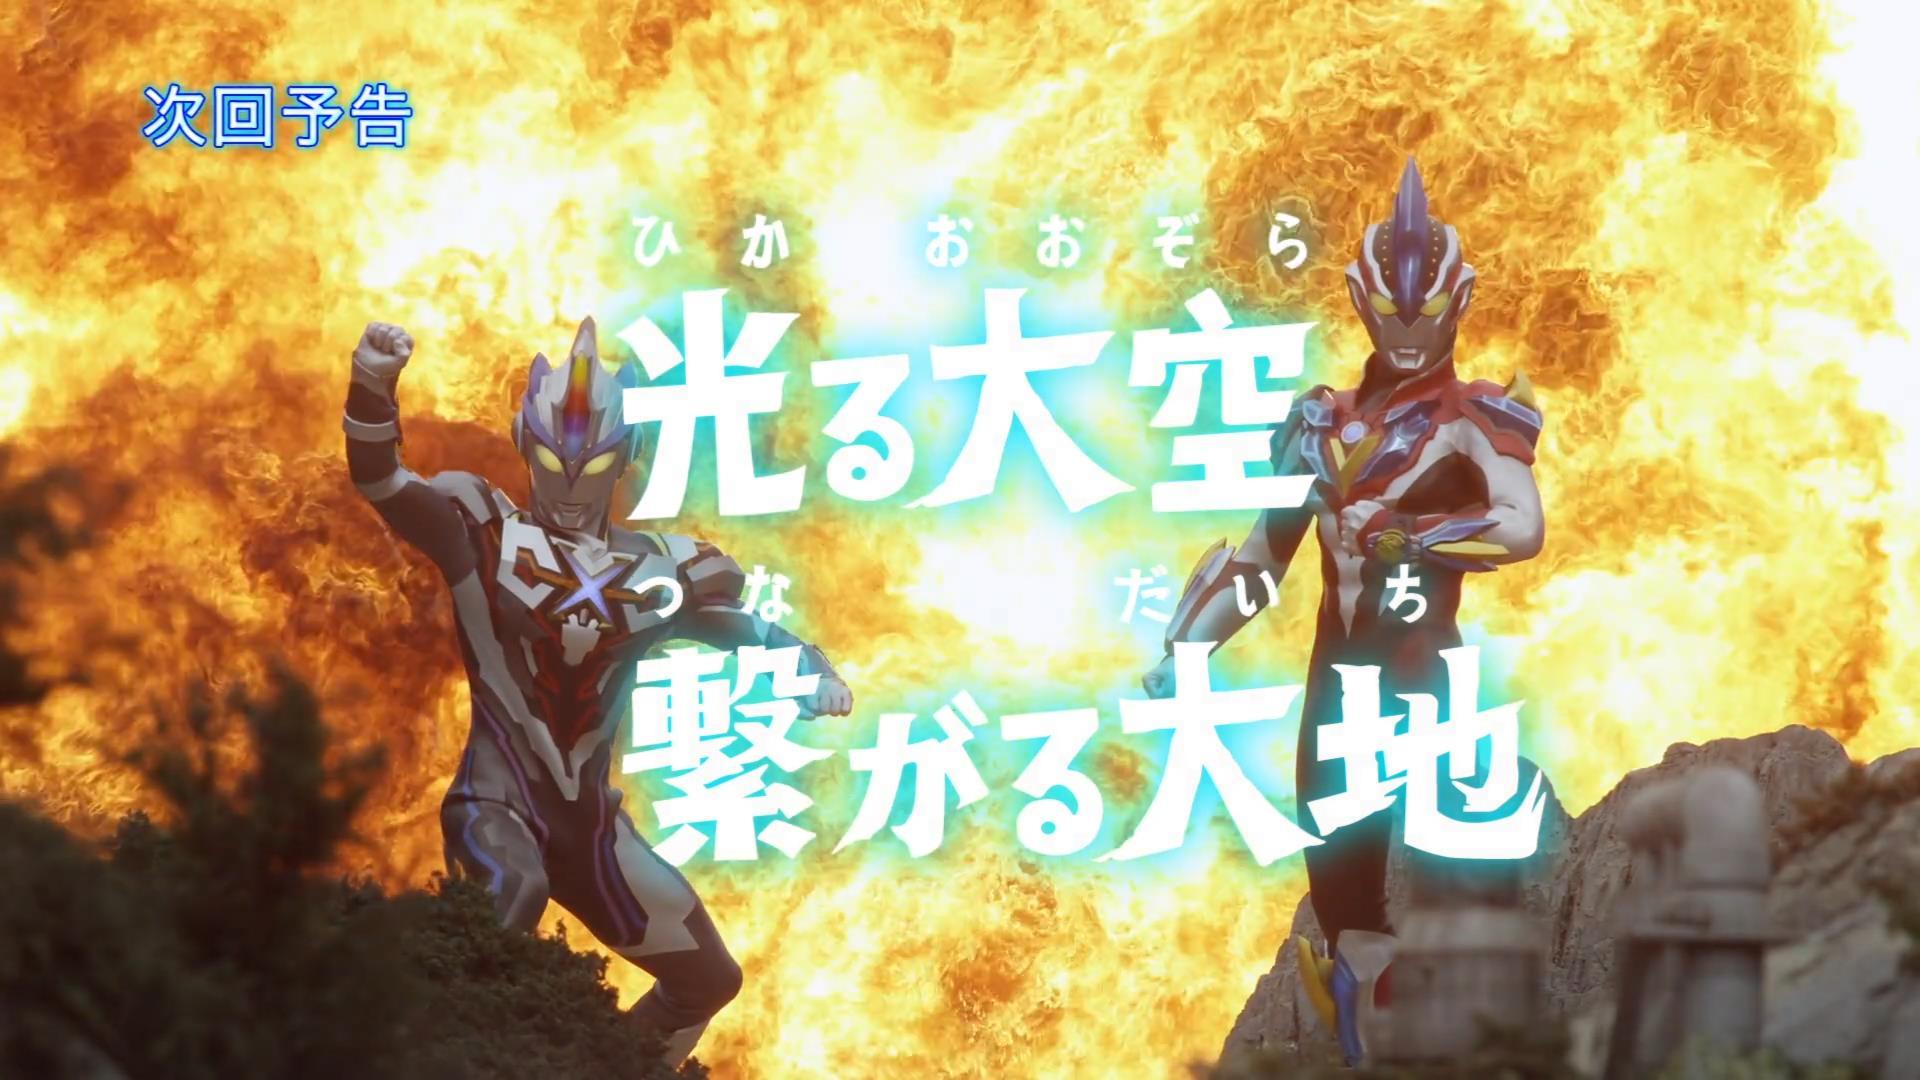 Next Time on Ultraman X: Episode 14